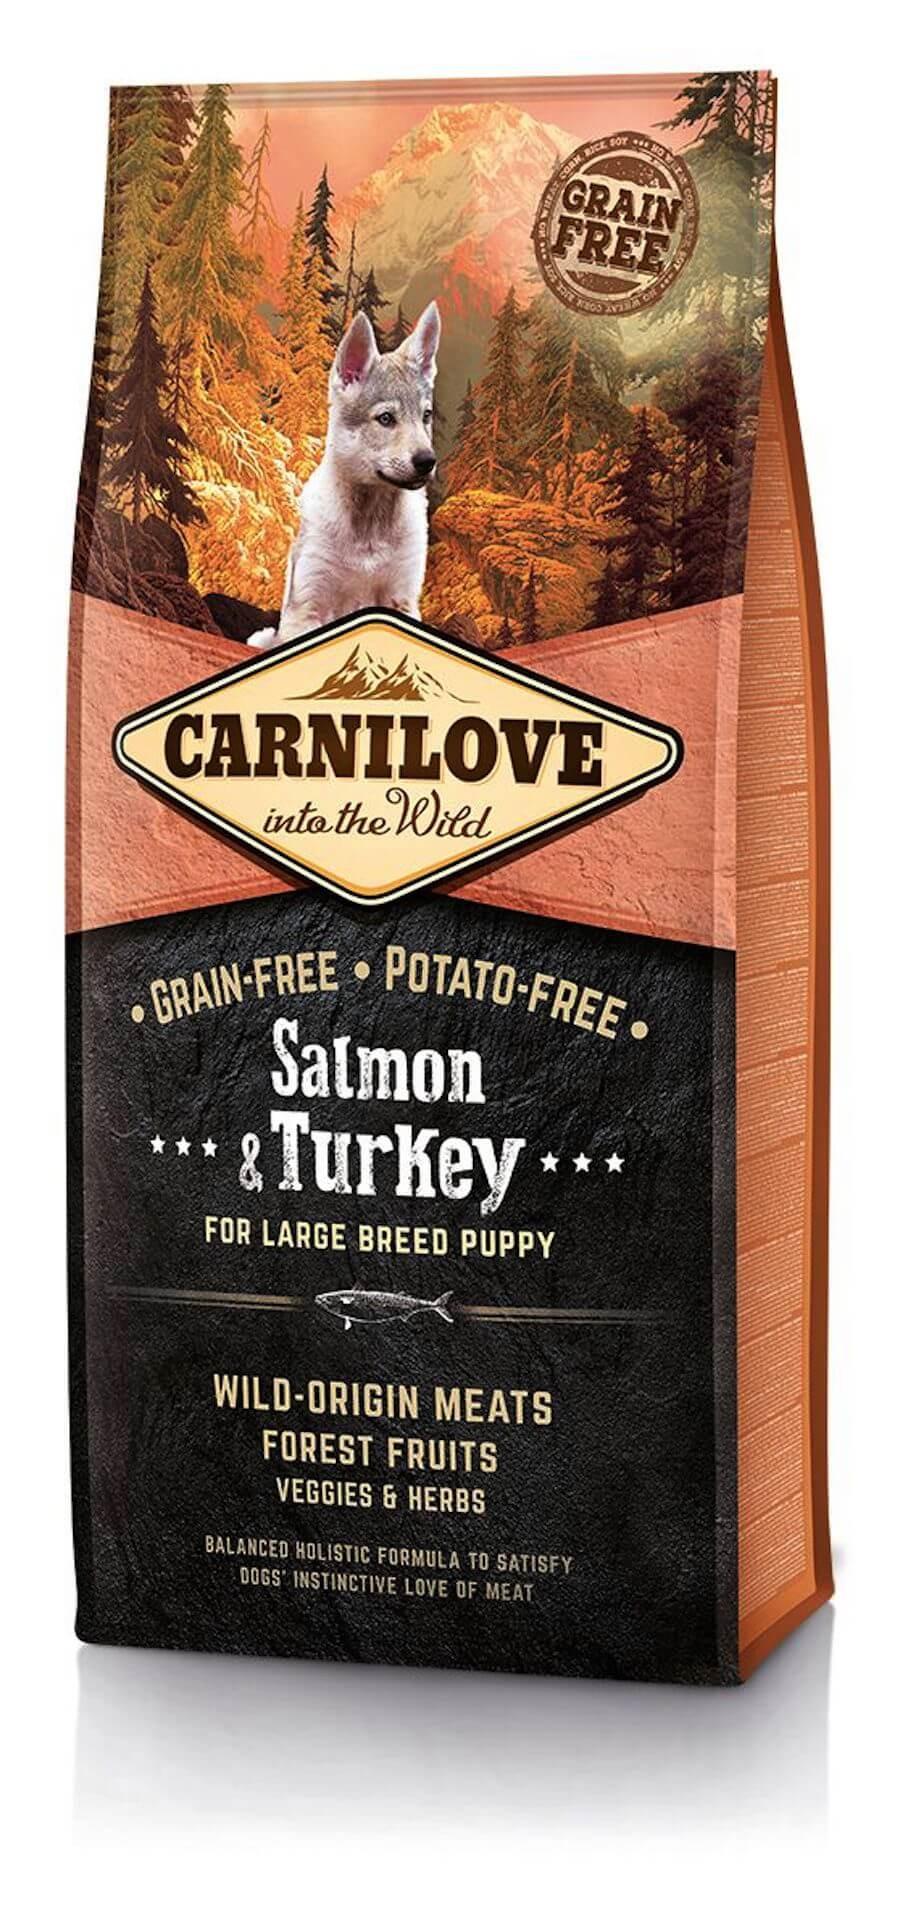 croquettes carnilove salmon turkey alimentation pour chiots. Black Bedroom Furniture Sets. Home Design Ideas